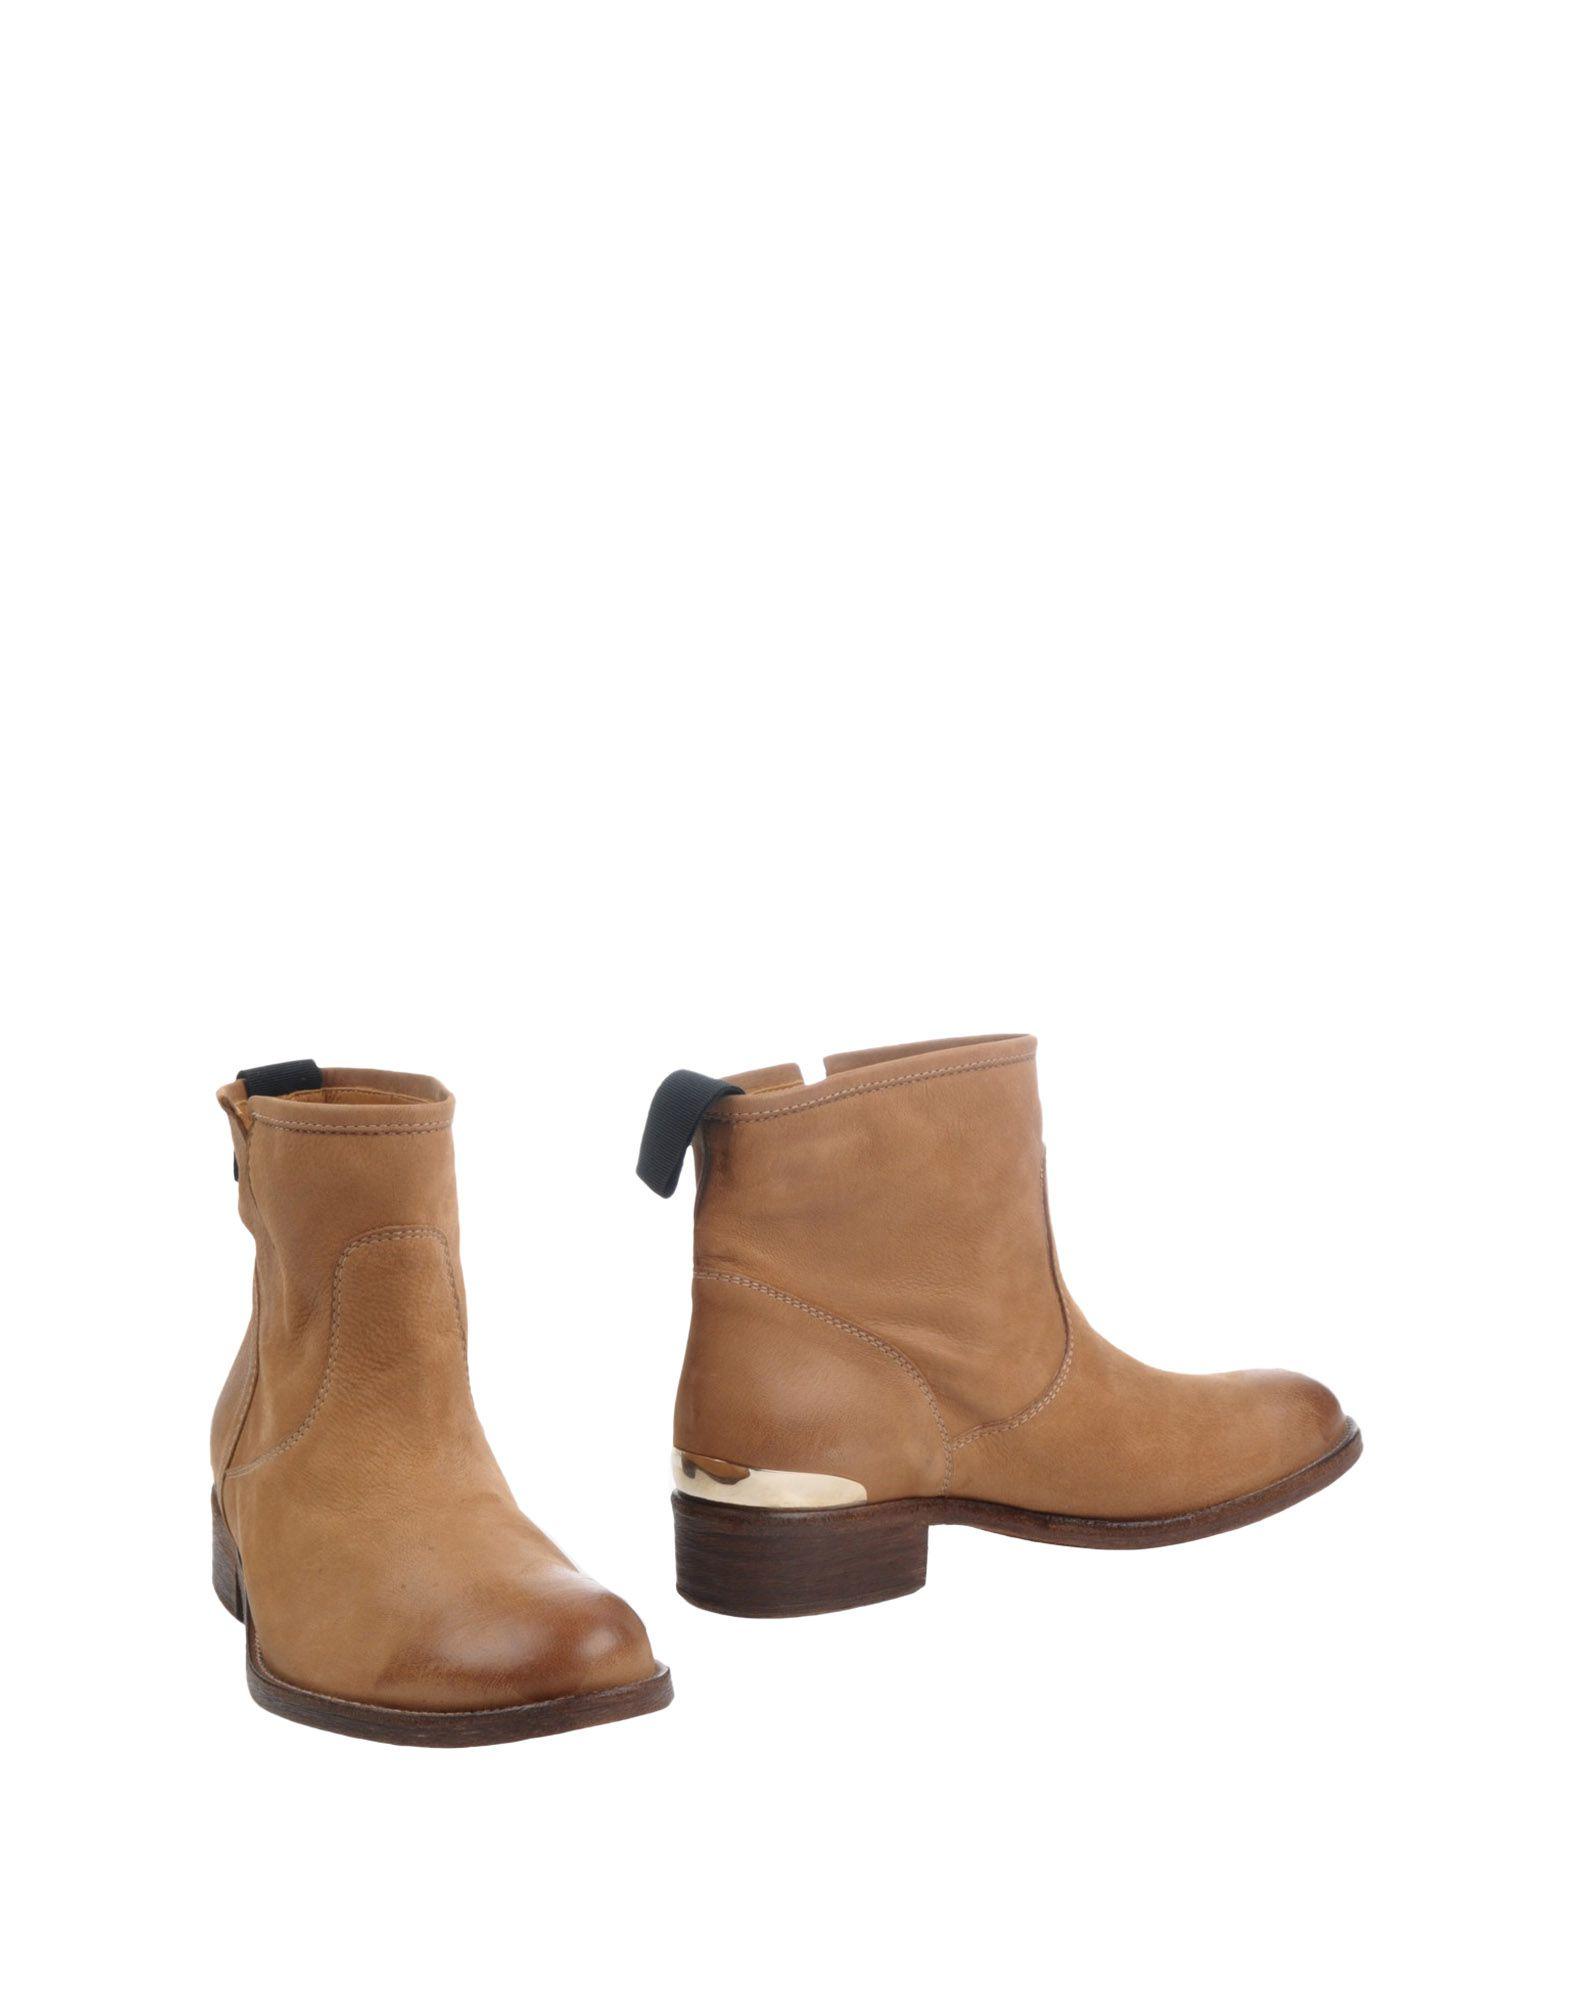 цена VIA ROMA 15 Полусапоги и высокие ботинки онлайн в 2017 году